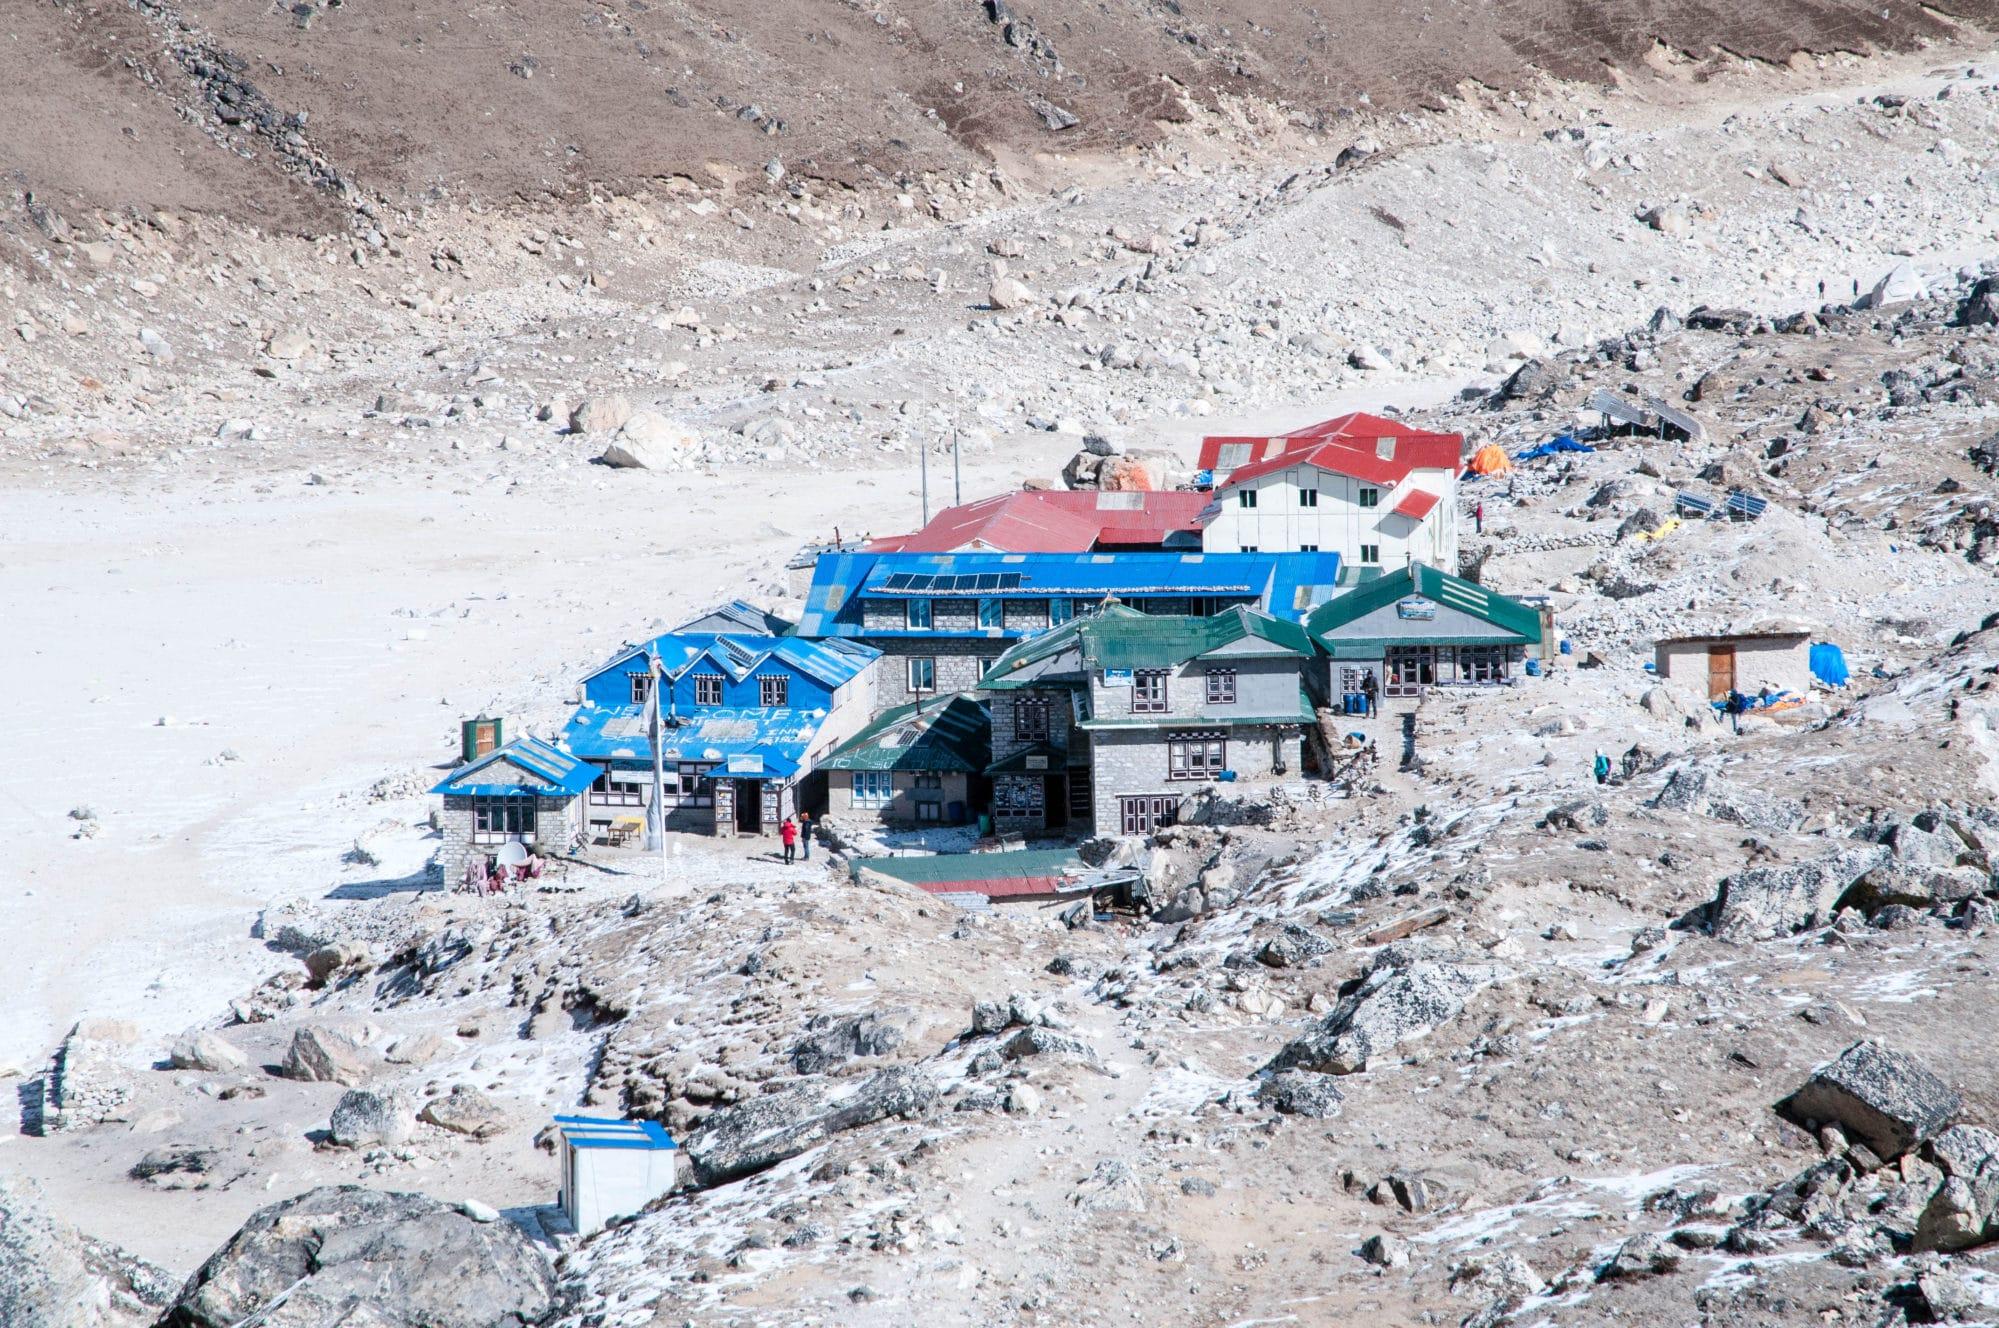 The small outpost of Gorakshep